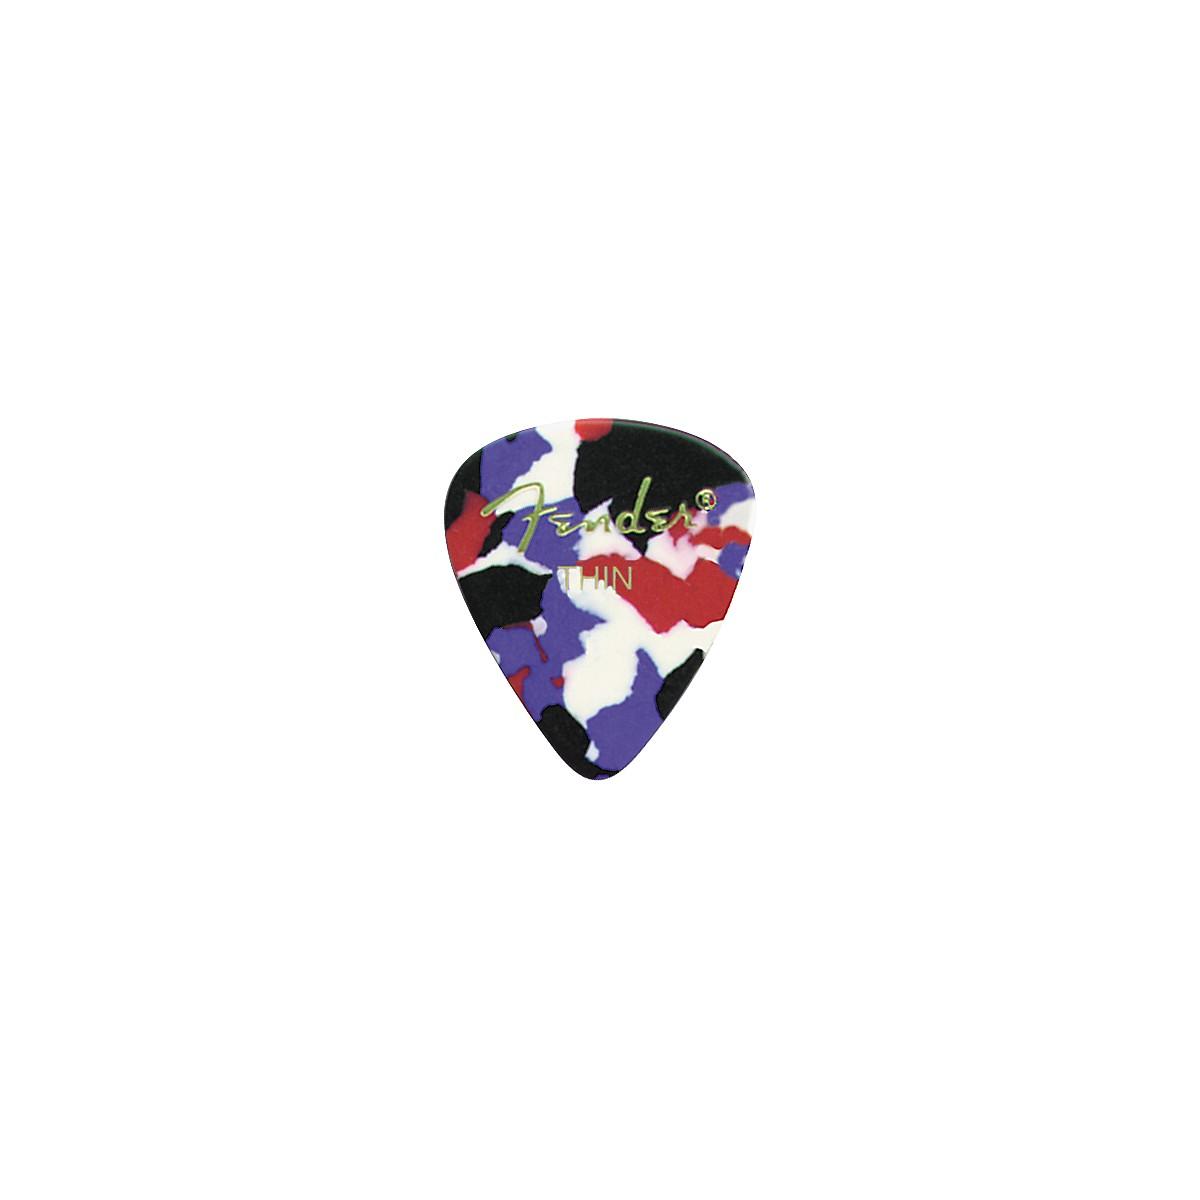 Fender Classic Celluloid Confetti Guitar Pick 12-Pack